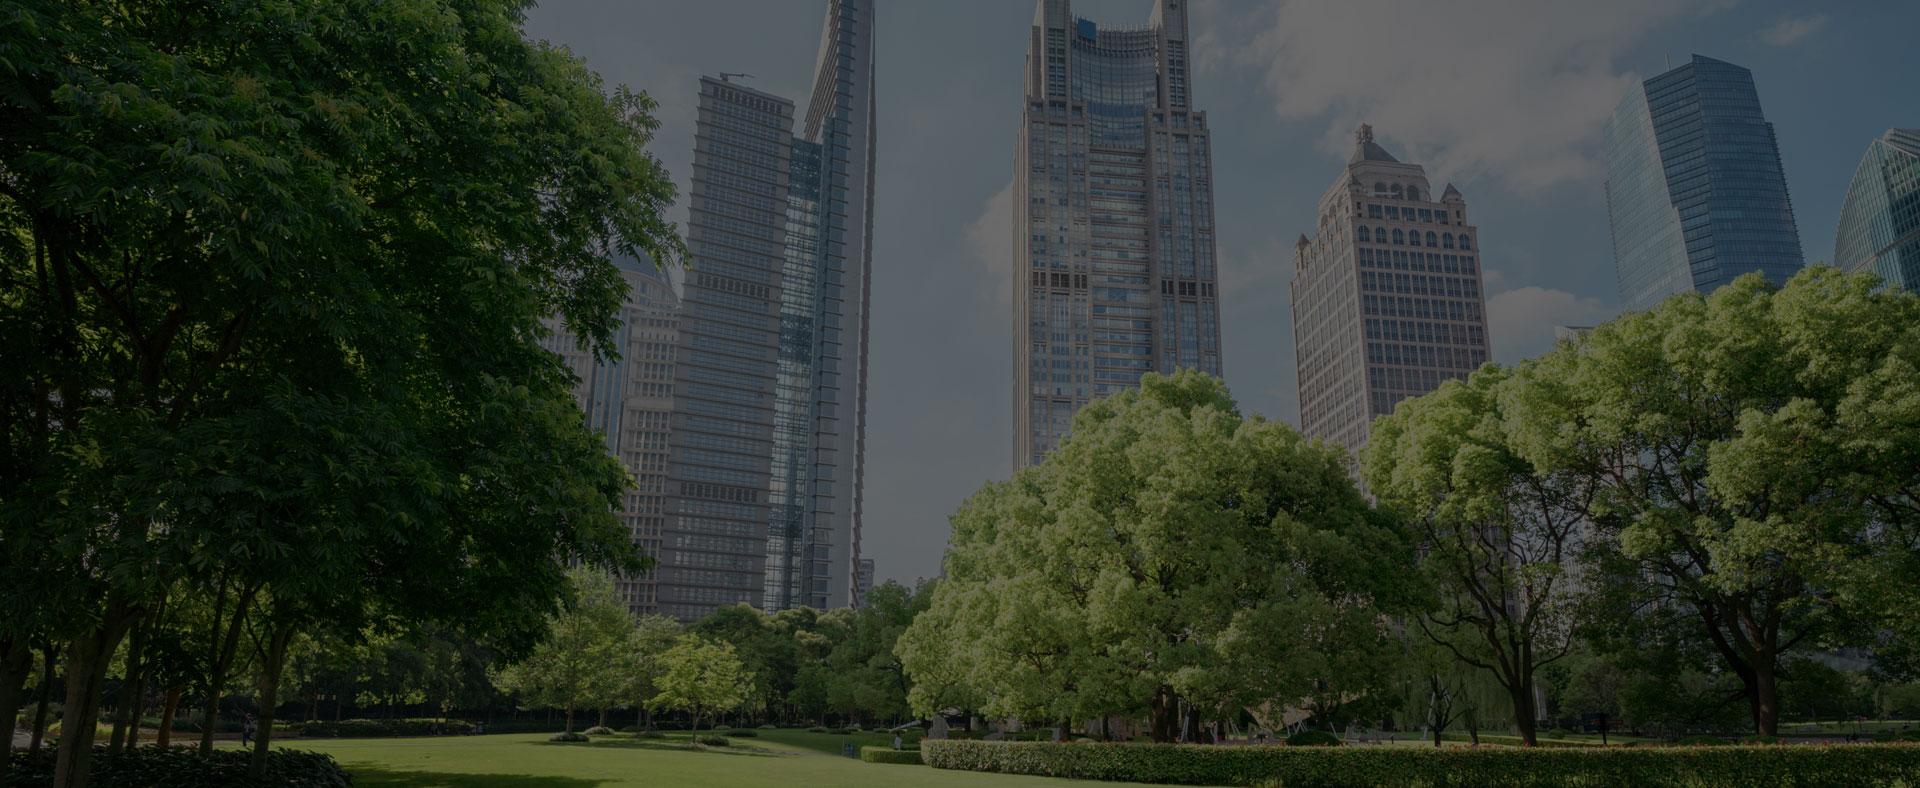 Espaces verts en milieu urbain